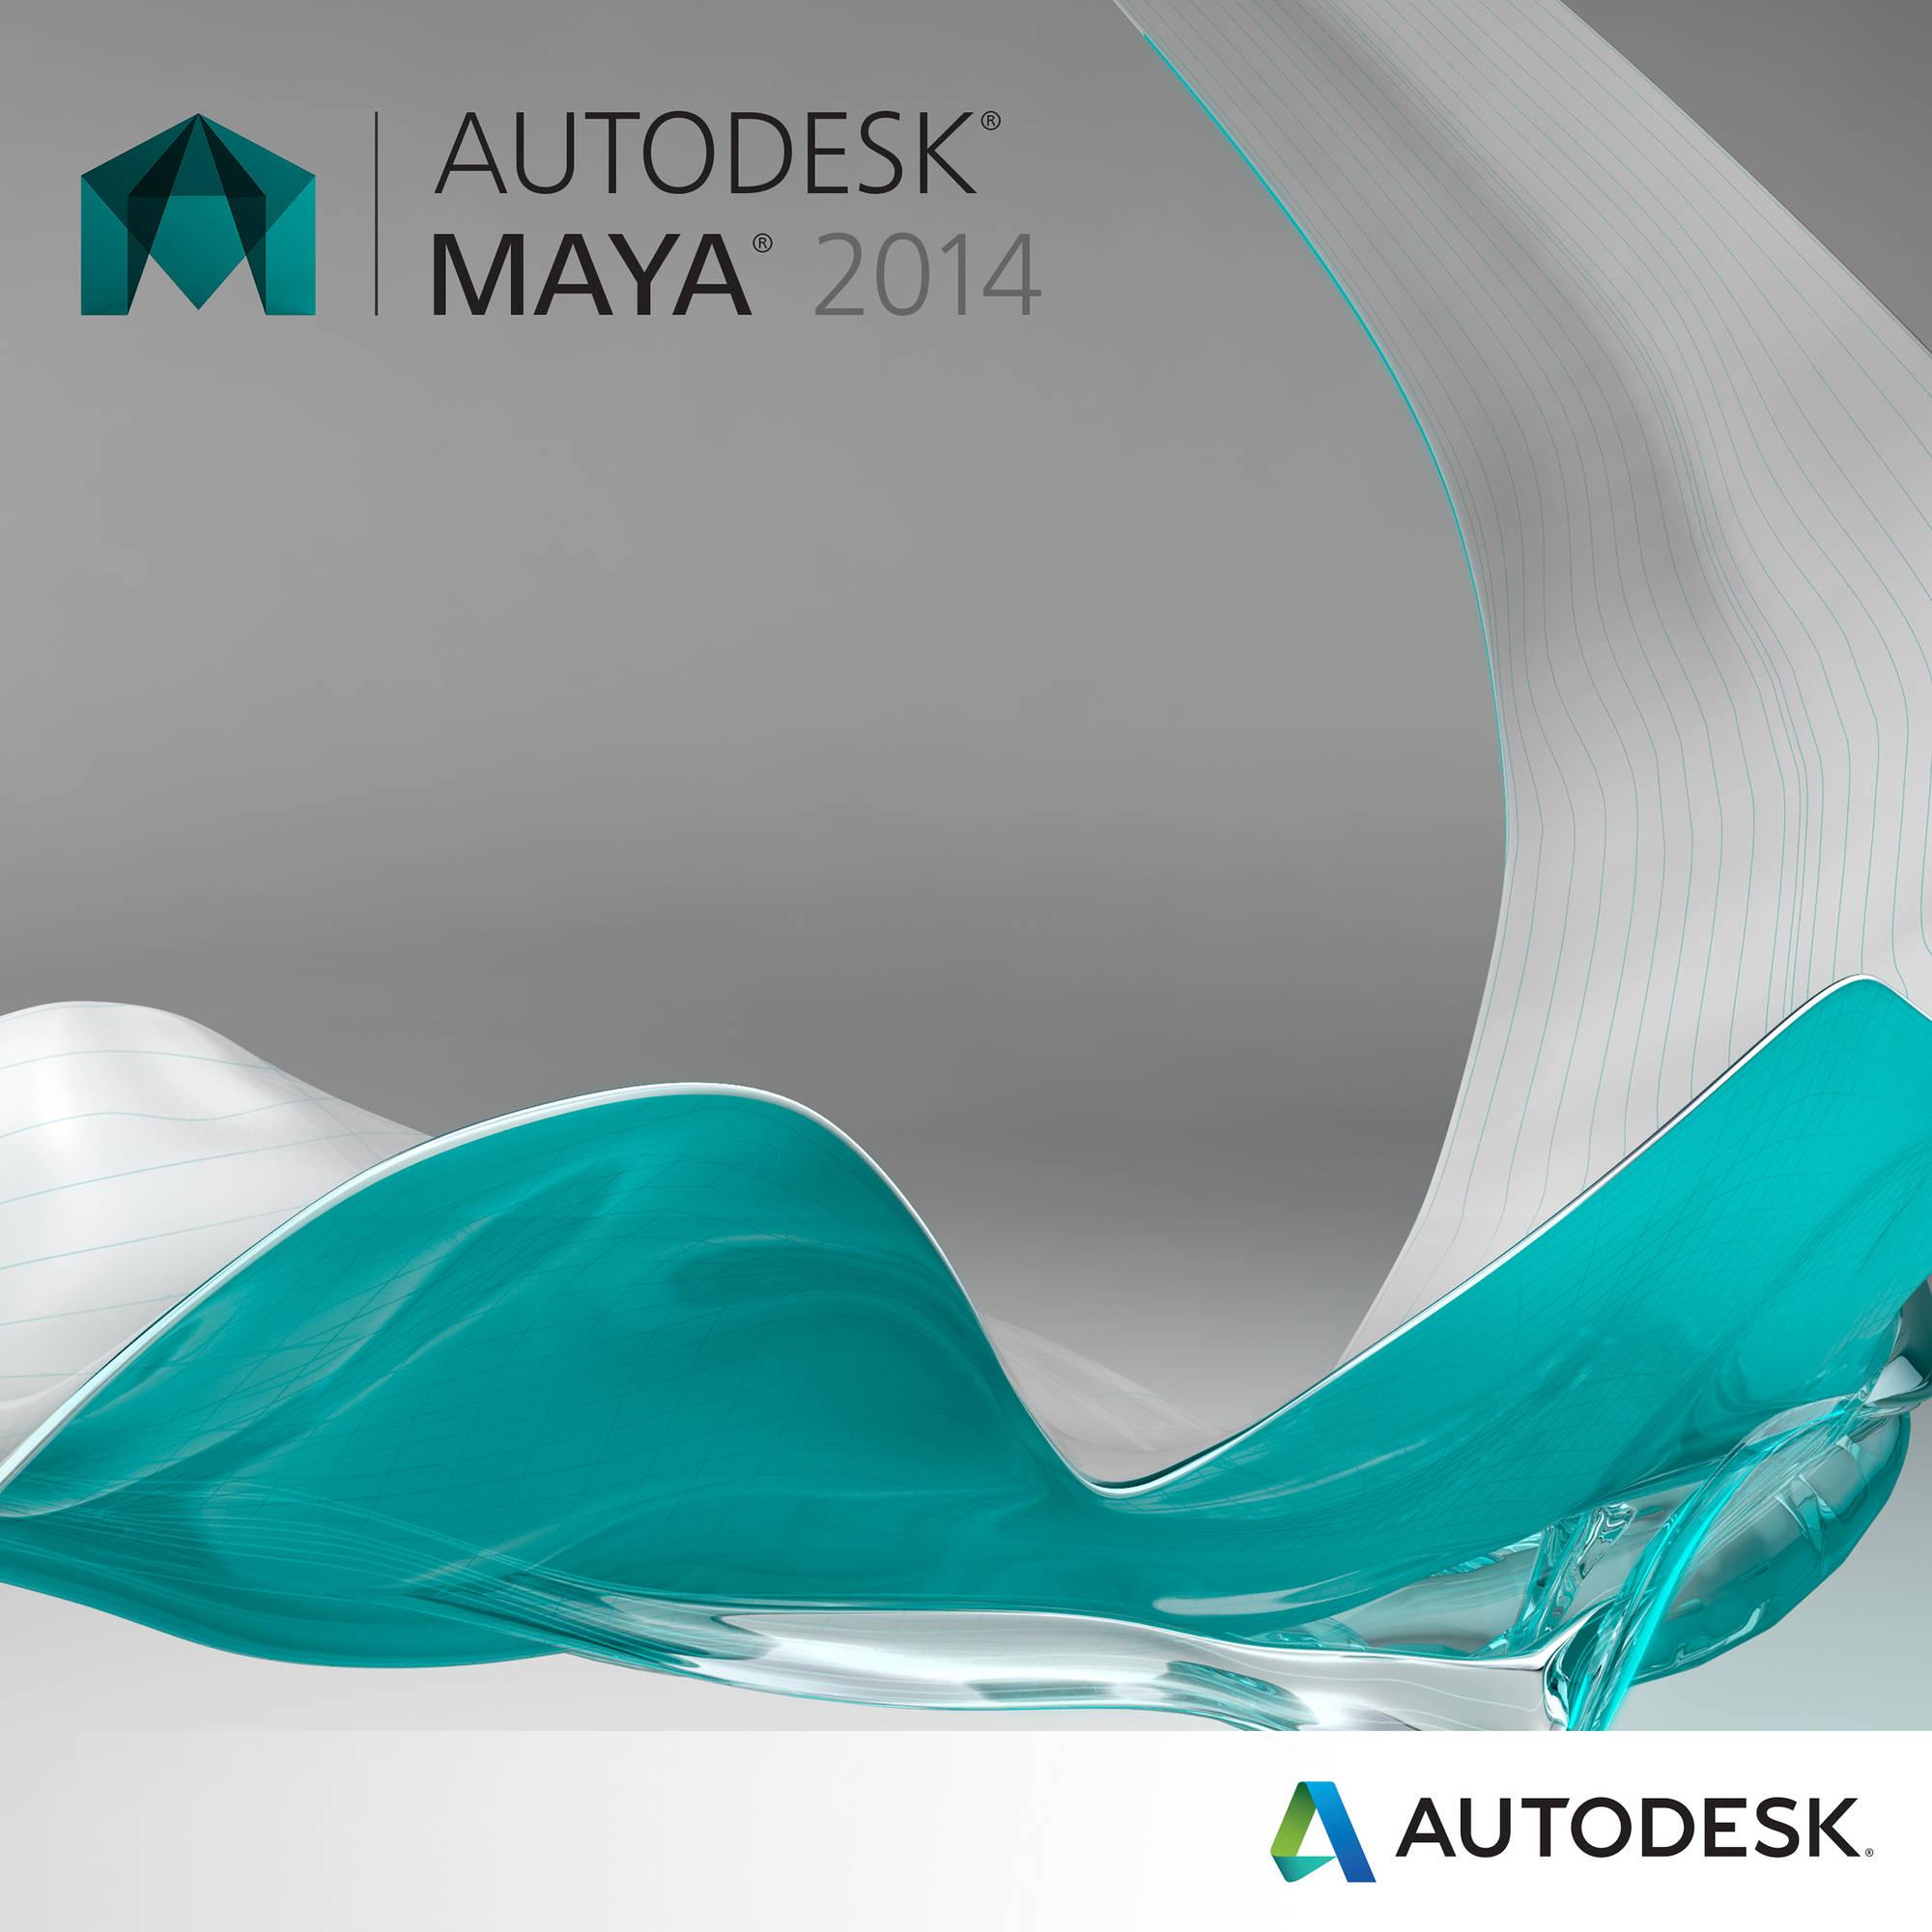 Autodesk Maya 2014 (SLM - Stand-Alone Licensing)